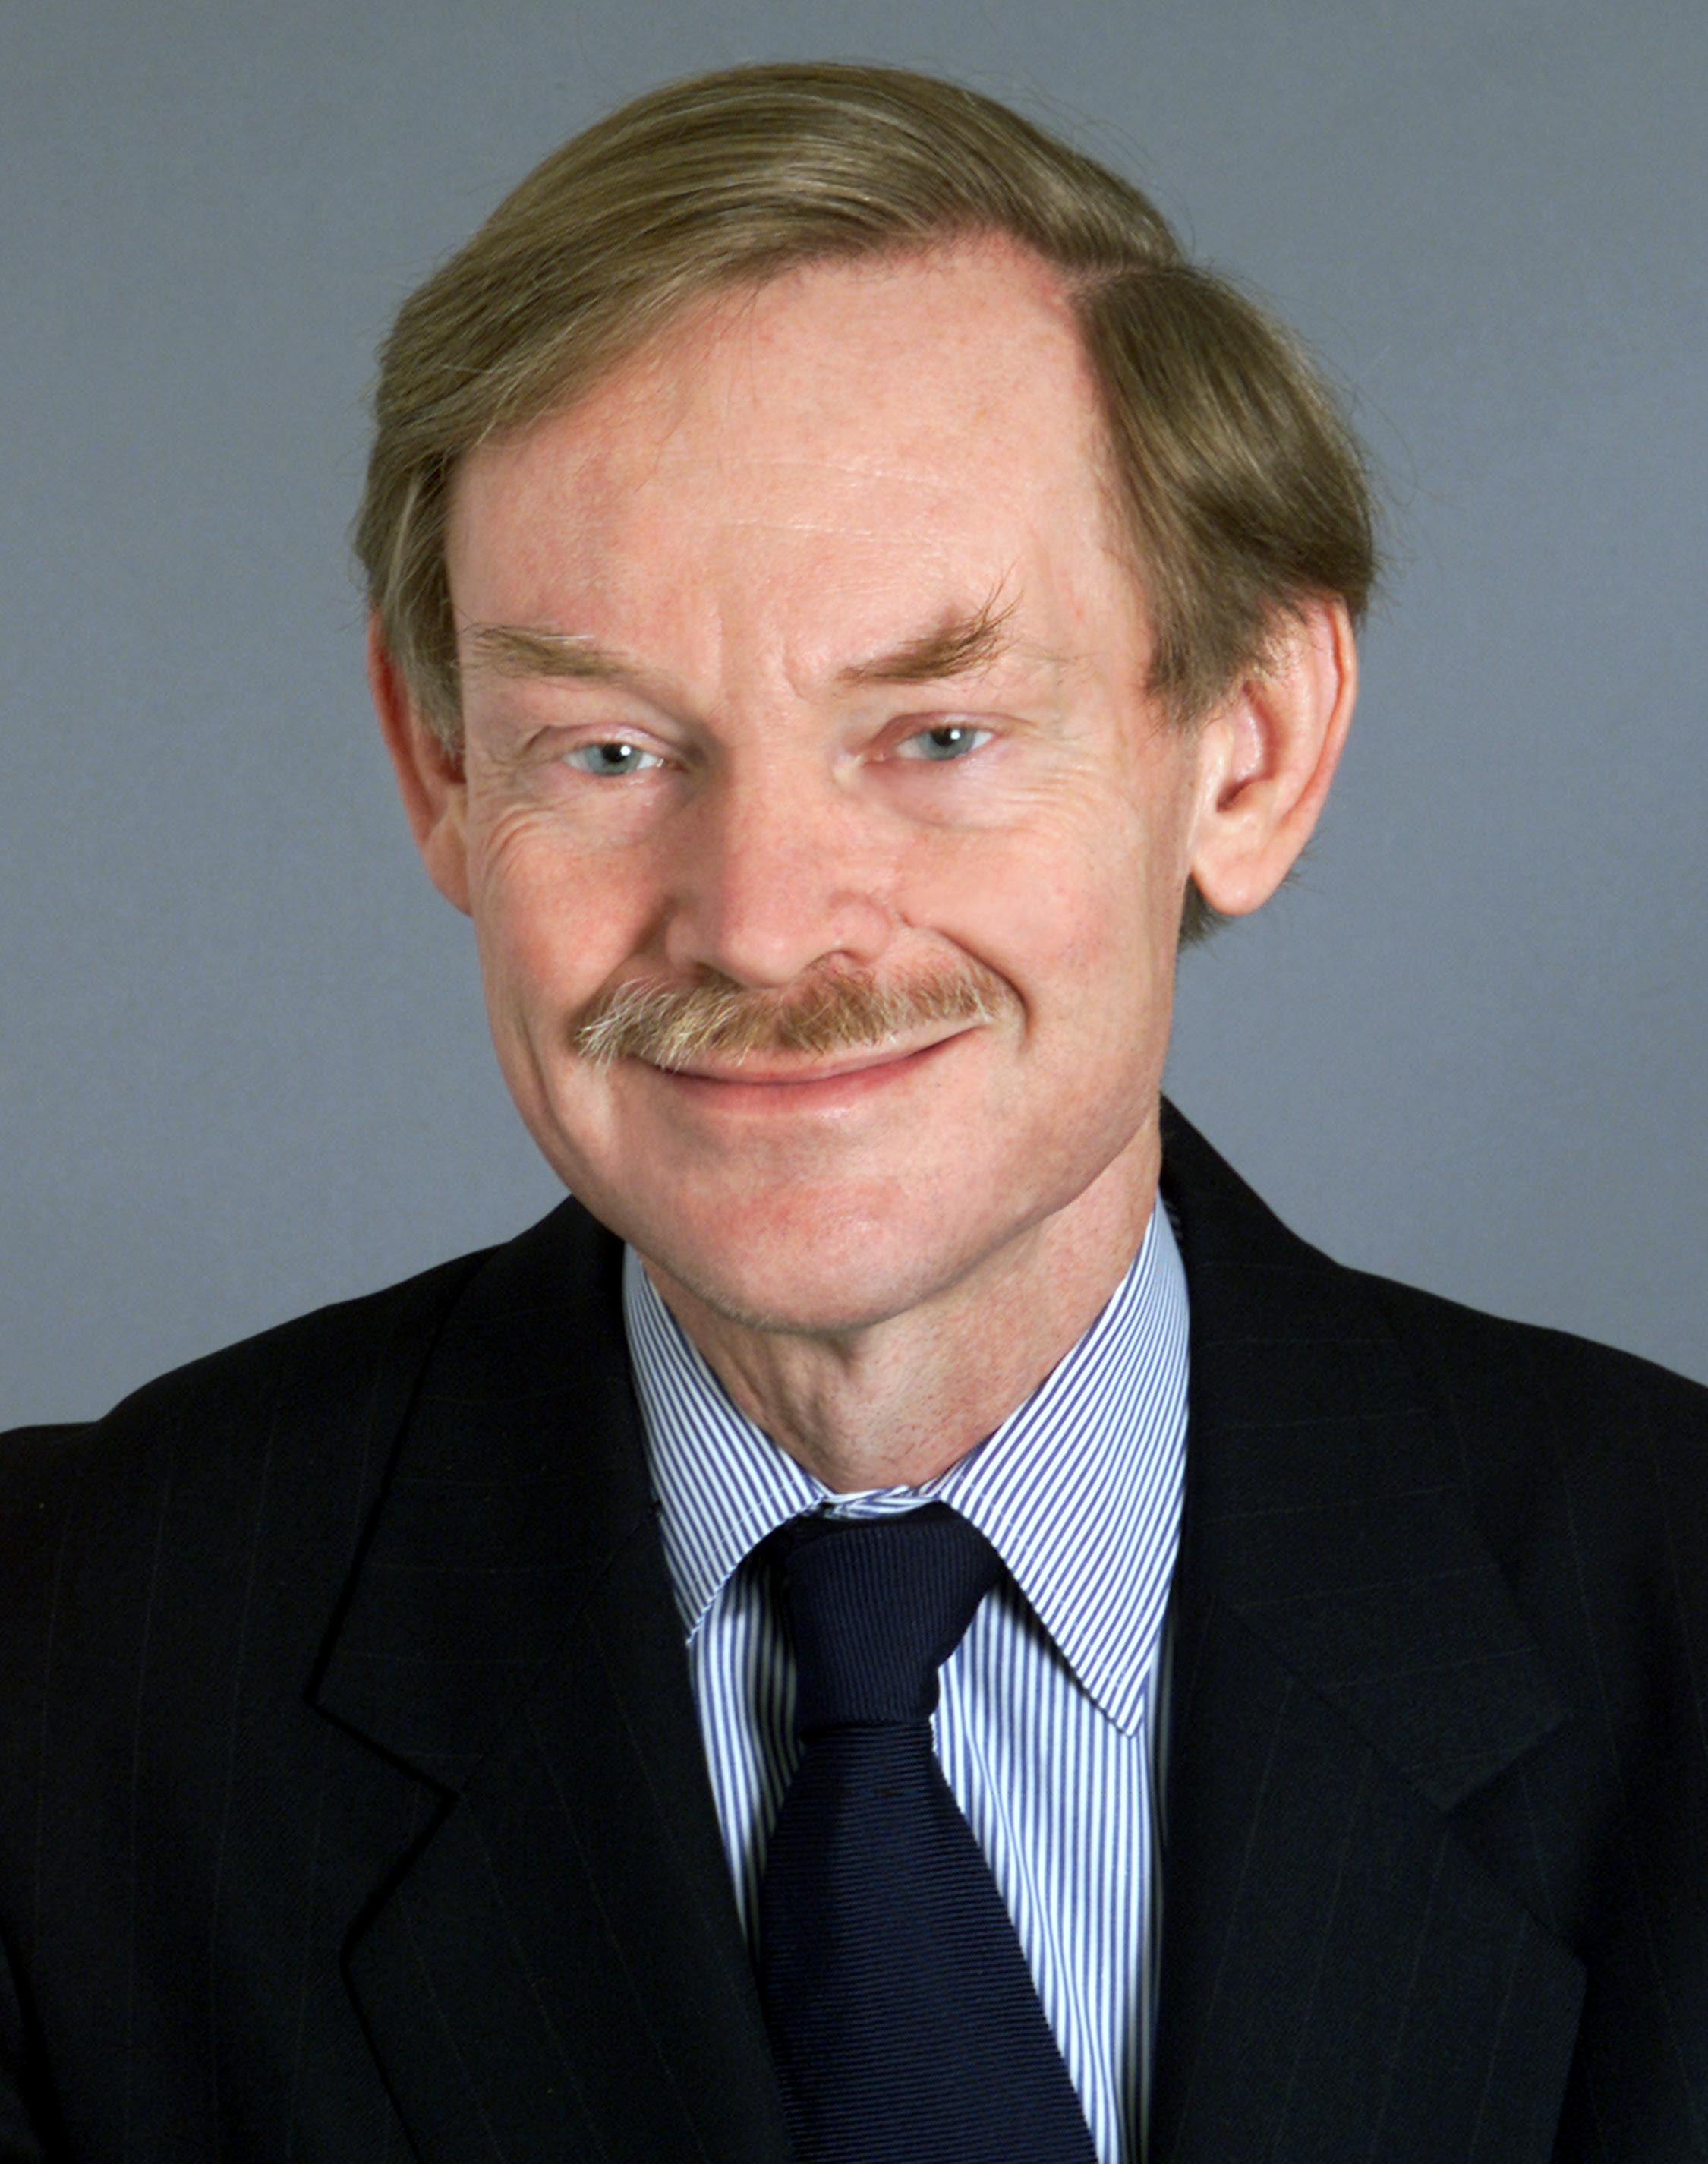 Robert B. Zoellick, President of the World Bank Group